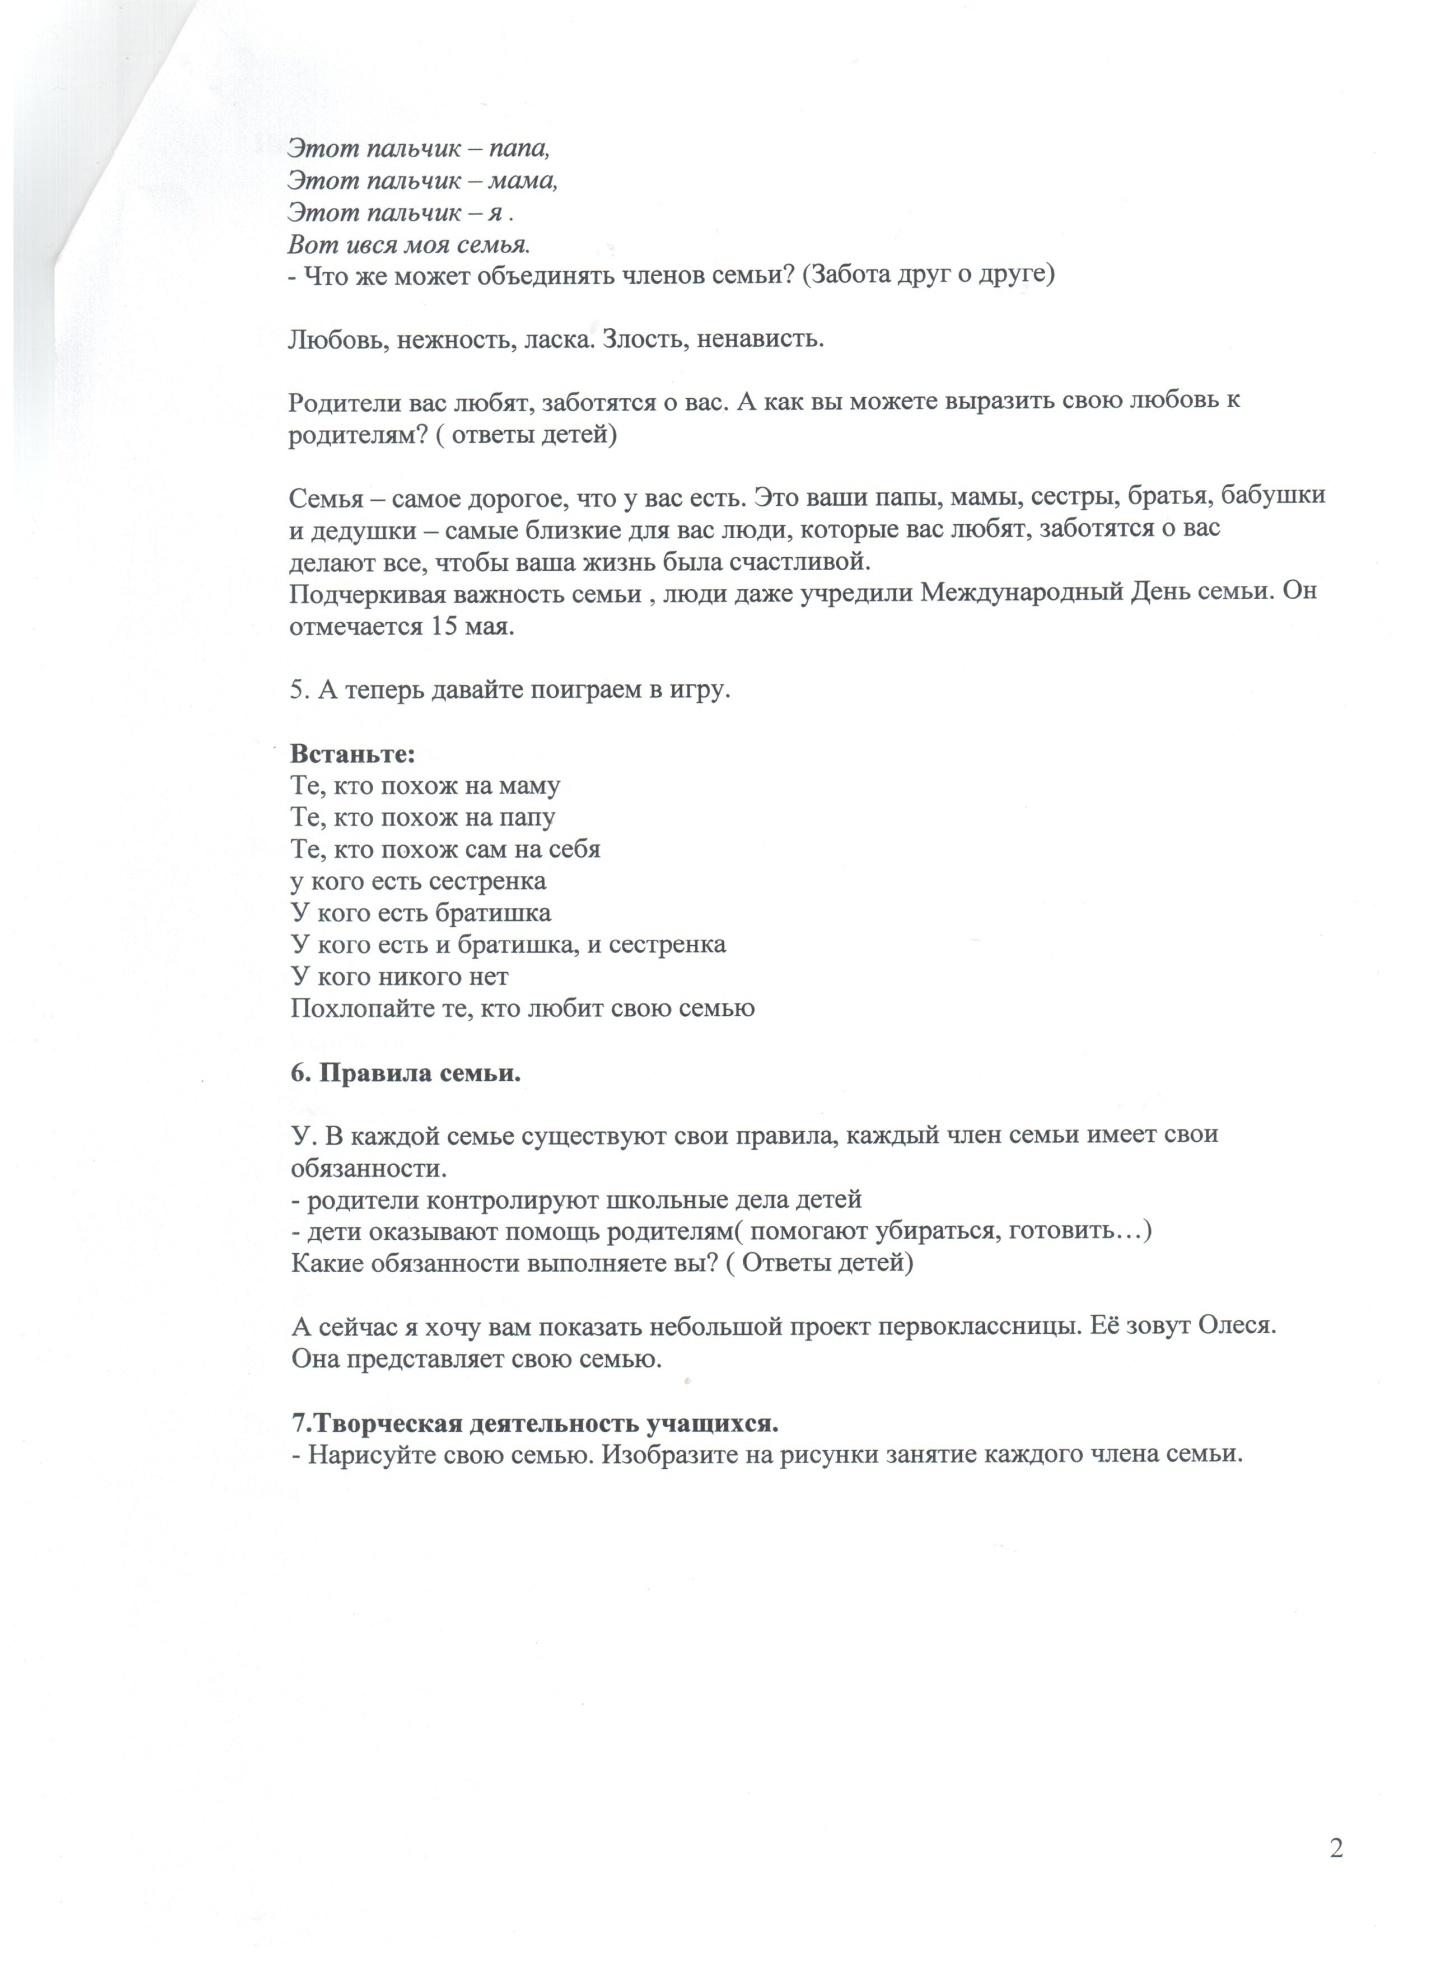 C:\Users\uzer\Desktop\2014-07-17 АЕ1\АЕ1 002.jpg